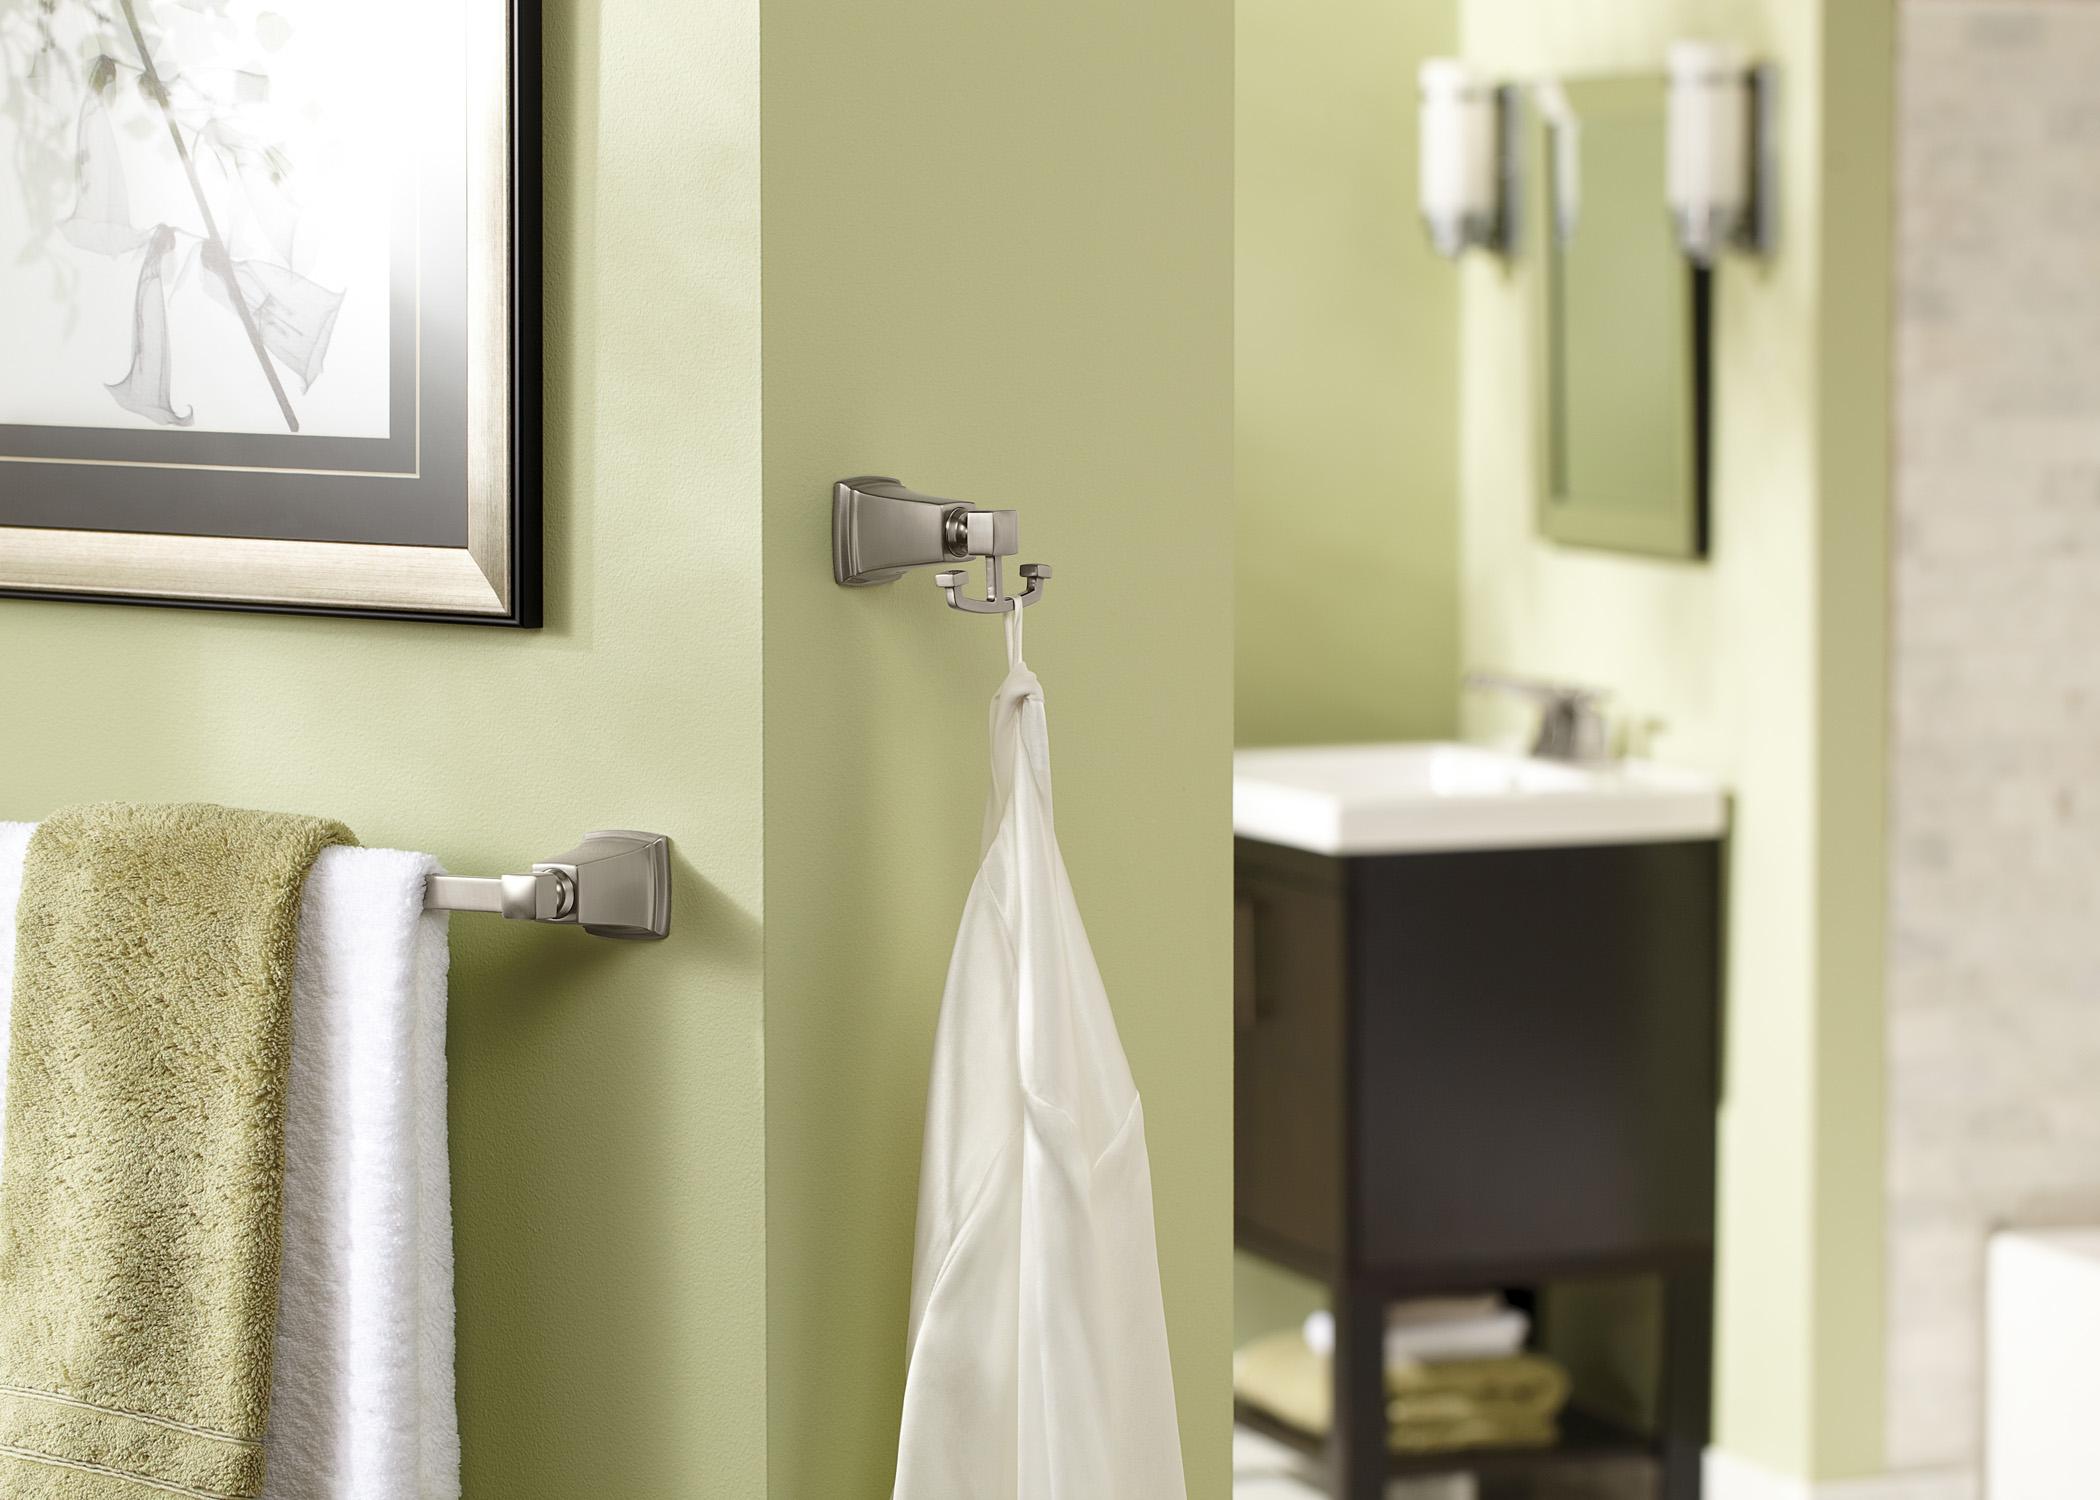 Simple Moen Bathroom Collections Boardwalk Accessories In Spot Resist Brushed Nickel R Inside Ideas